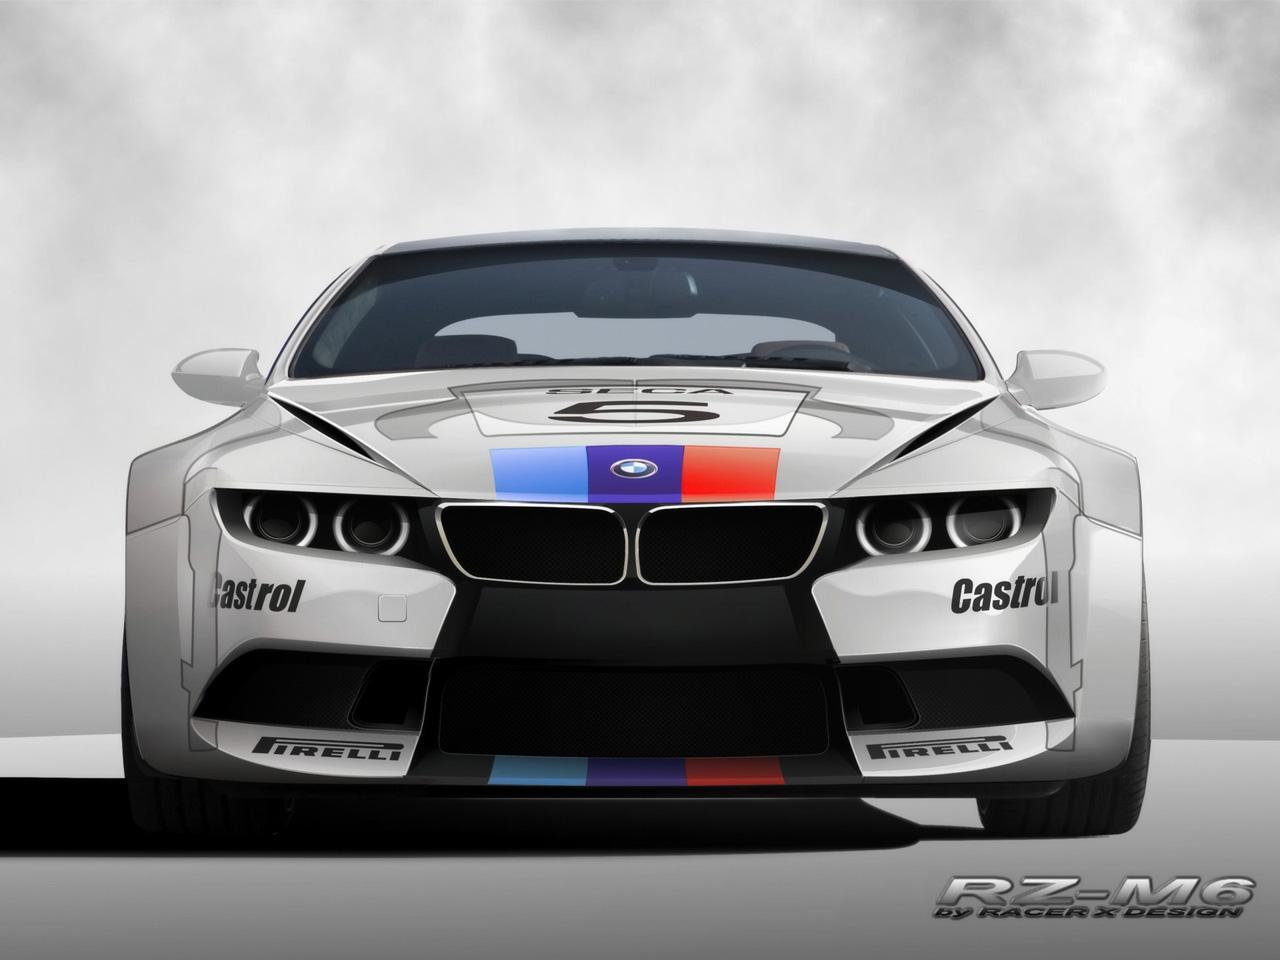 Bmw Car Wallpapers Hd Bmw M Concept Cars 1280x960 Wallpaper Teahub Io